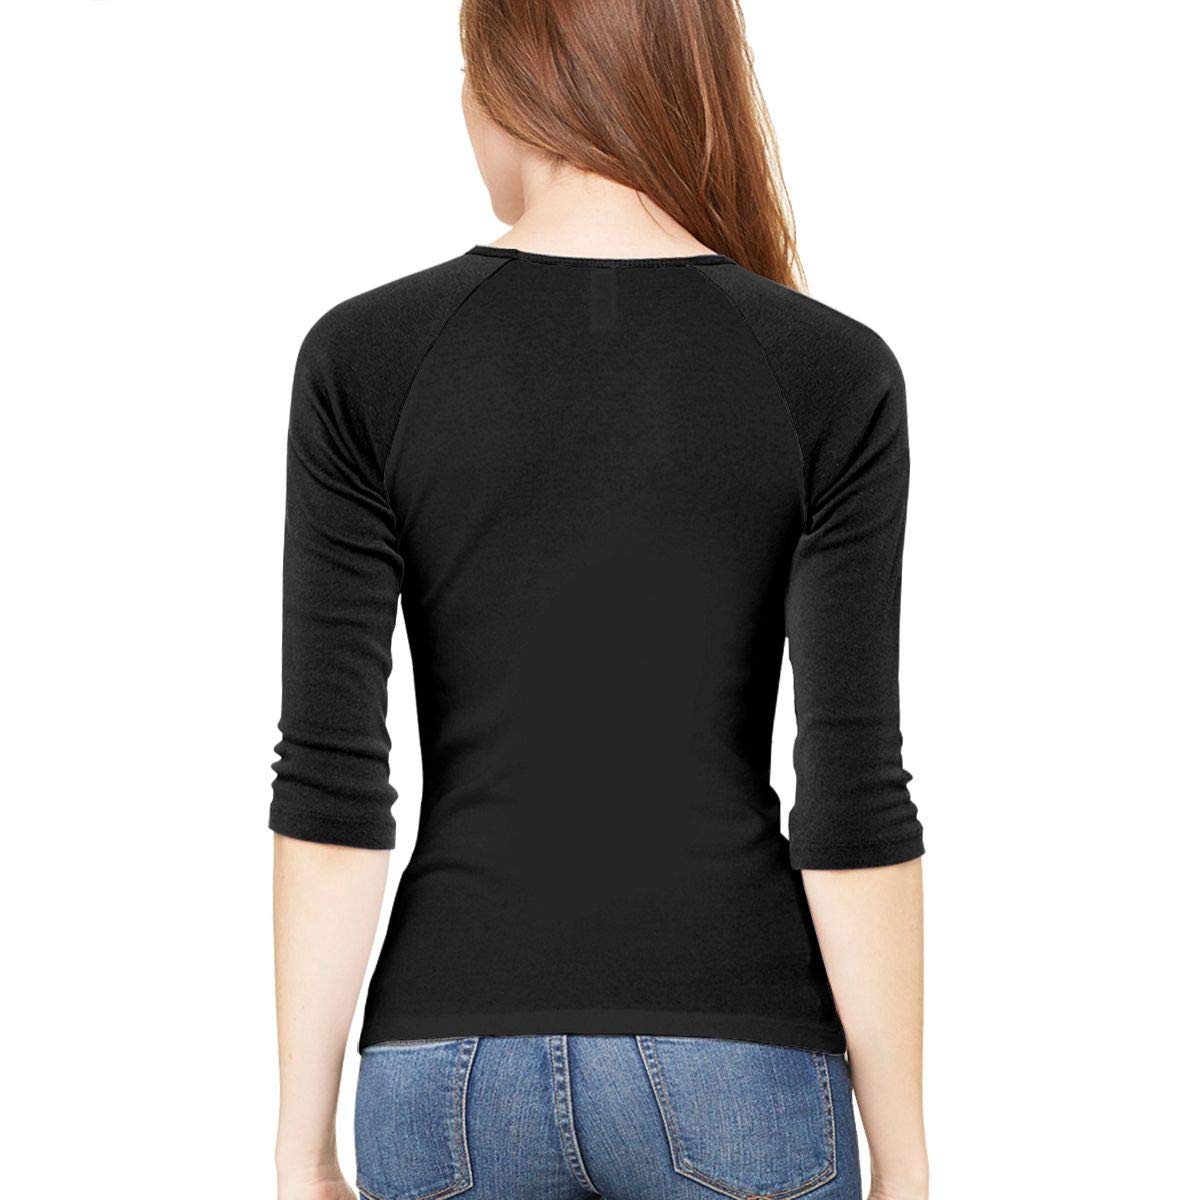 XYMYFC-E Gecko Mom Leopard Gecko Graphic Adult Womens Long-Sleeved Tee Shirt